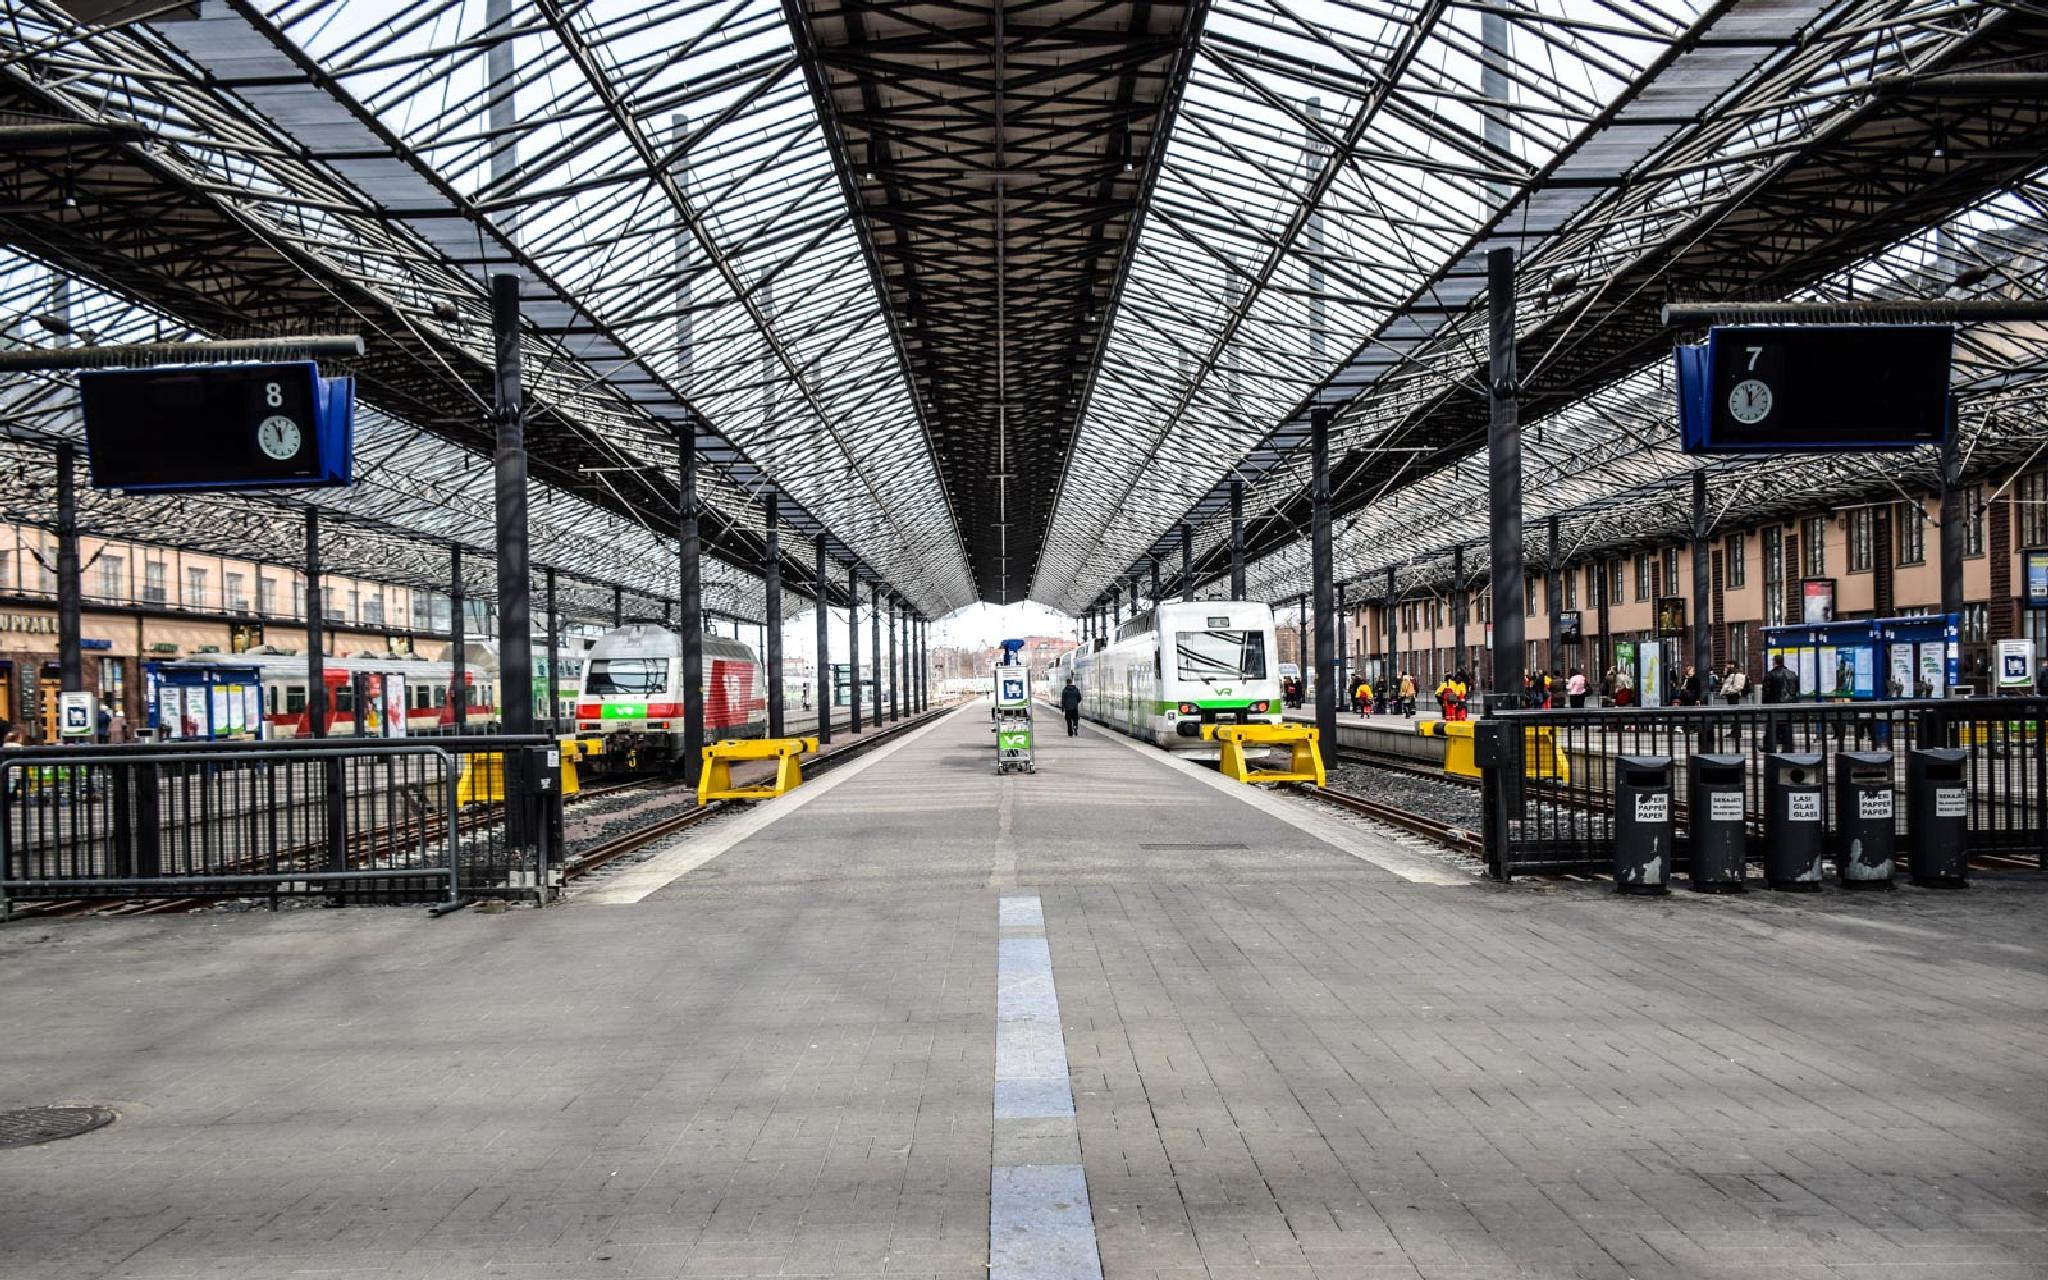 Platform 7 - 8  by aronrielle